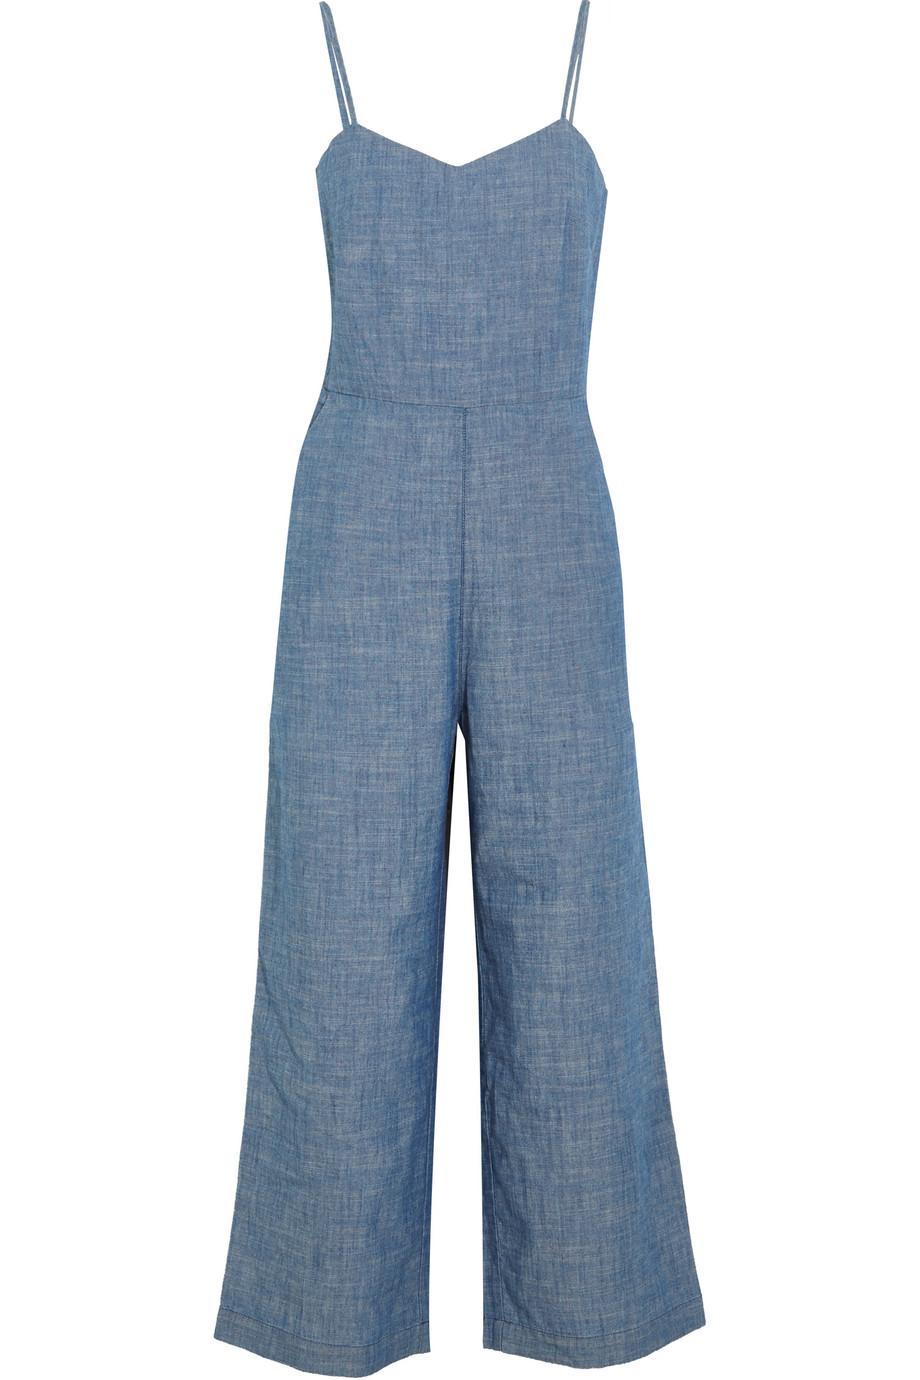 J.Crew Roadrunner Cotton-Chambray Jumpsuit, Blue, Women's, Size: 2